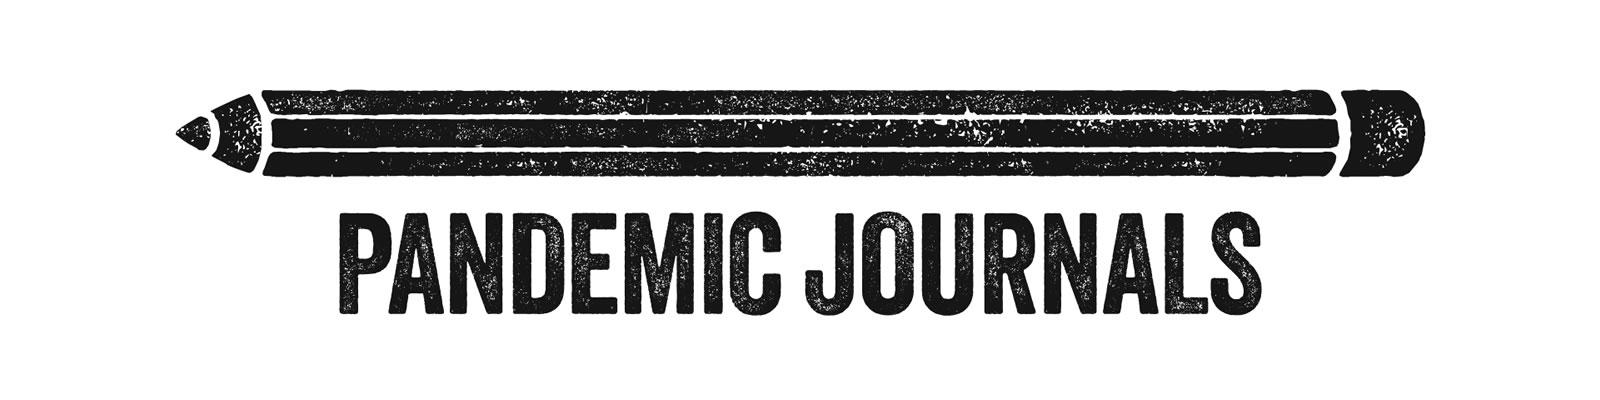 Pandemic Journals